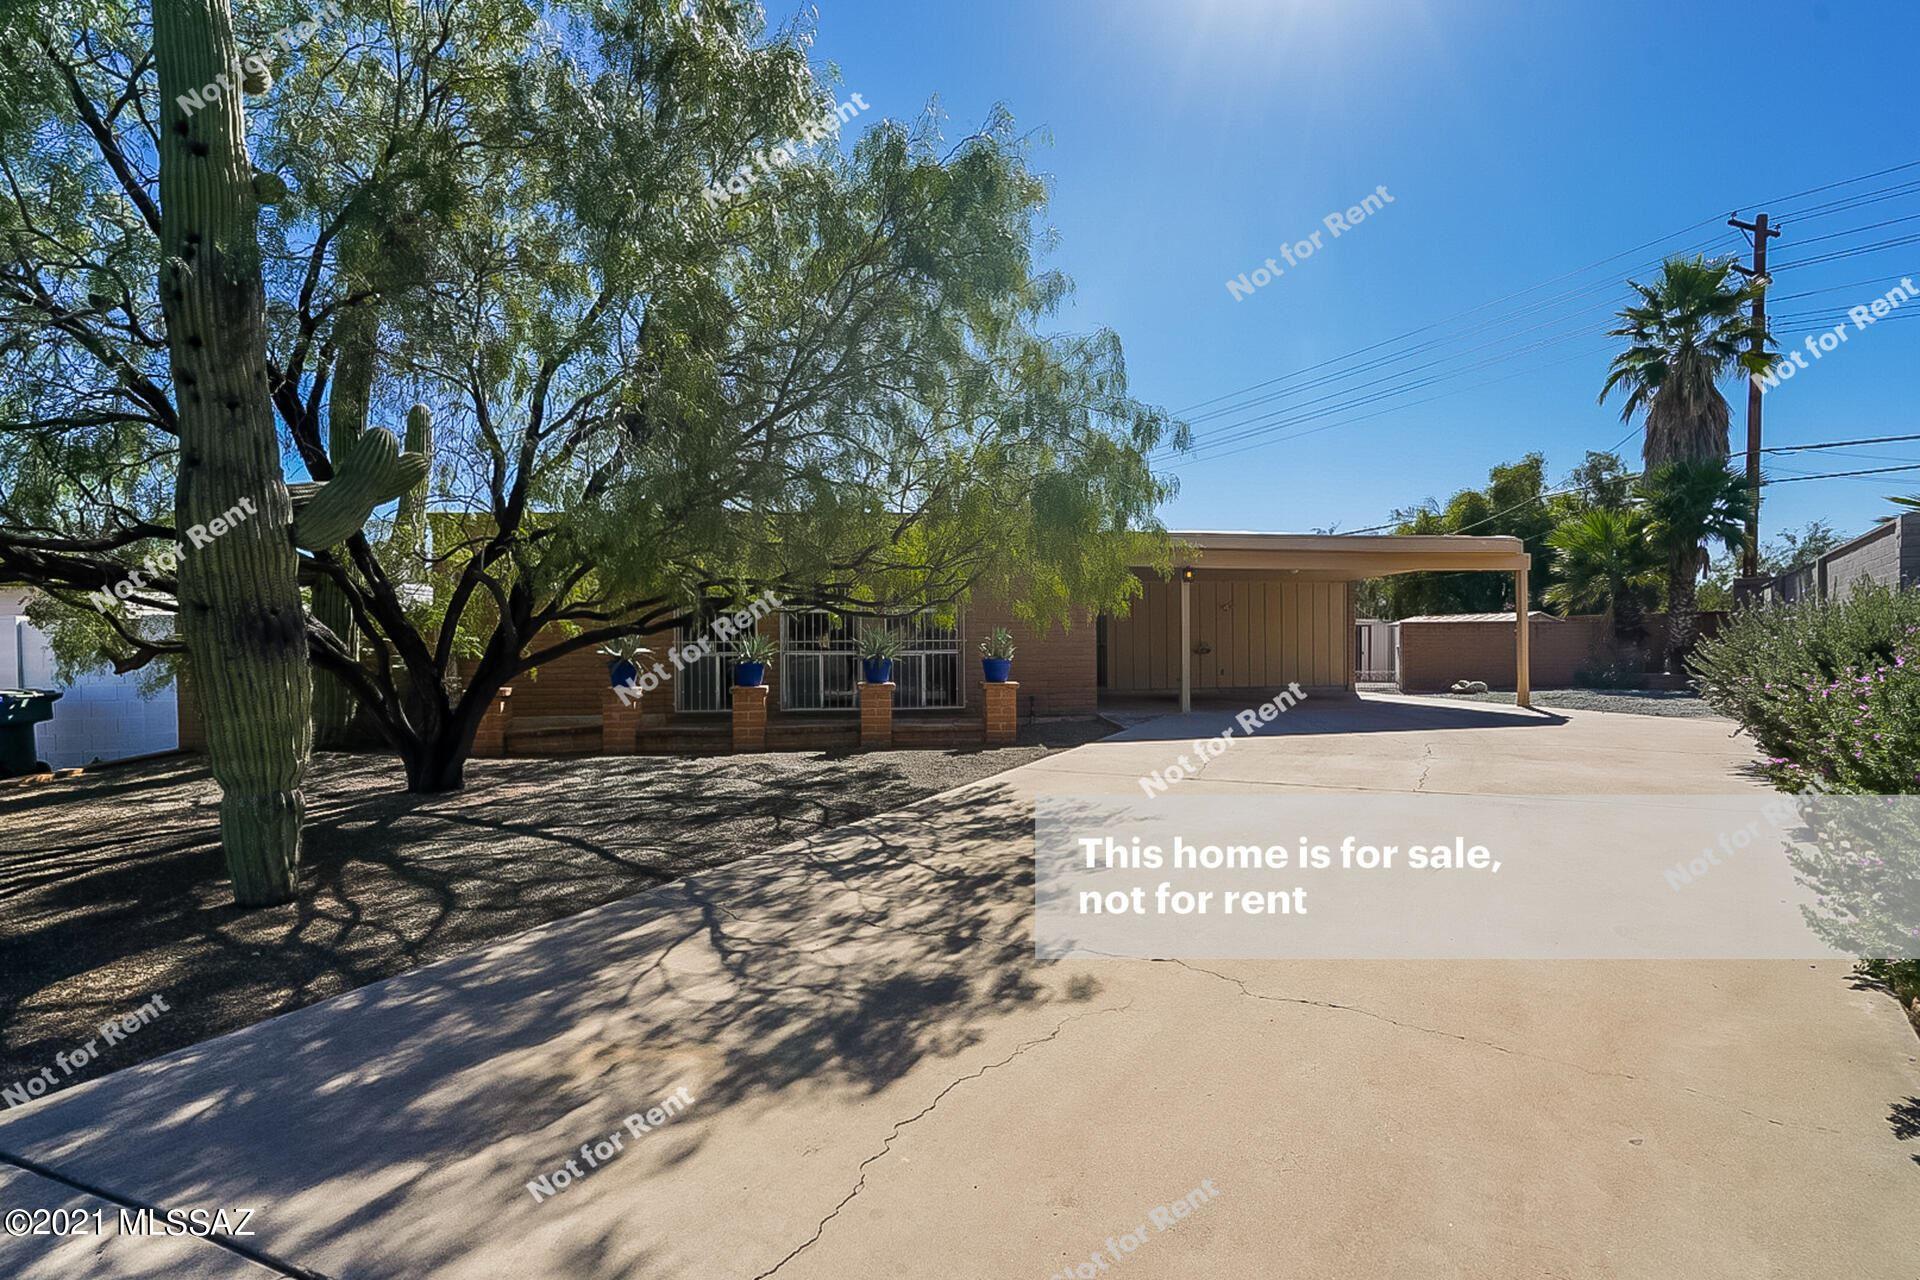 630 N Mann Circle, Tucson, AZ 85710 - MLS#: 22126874